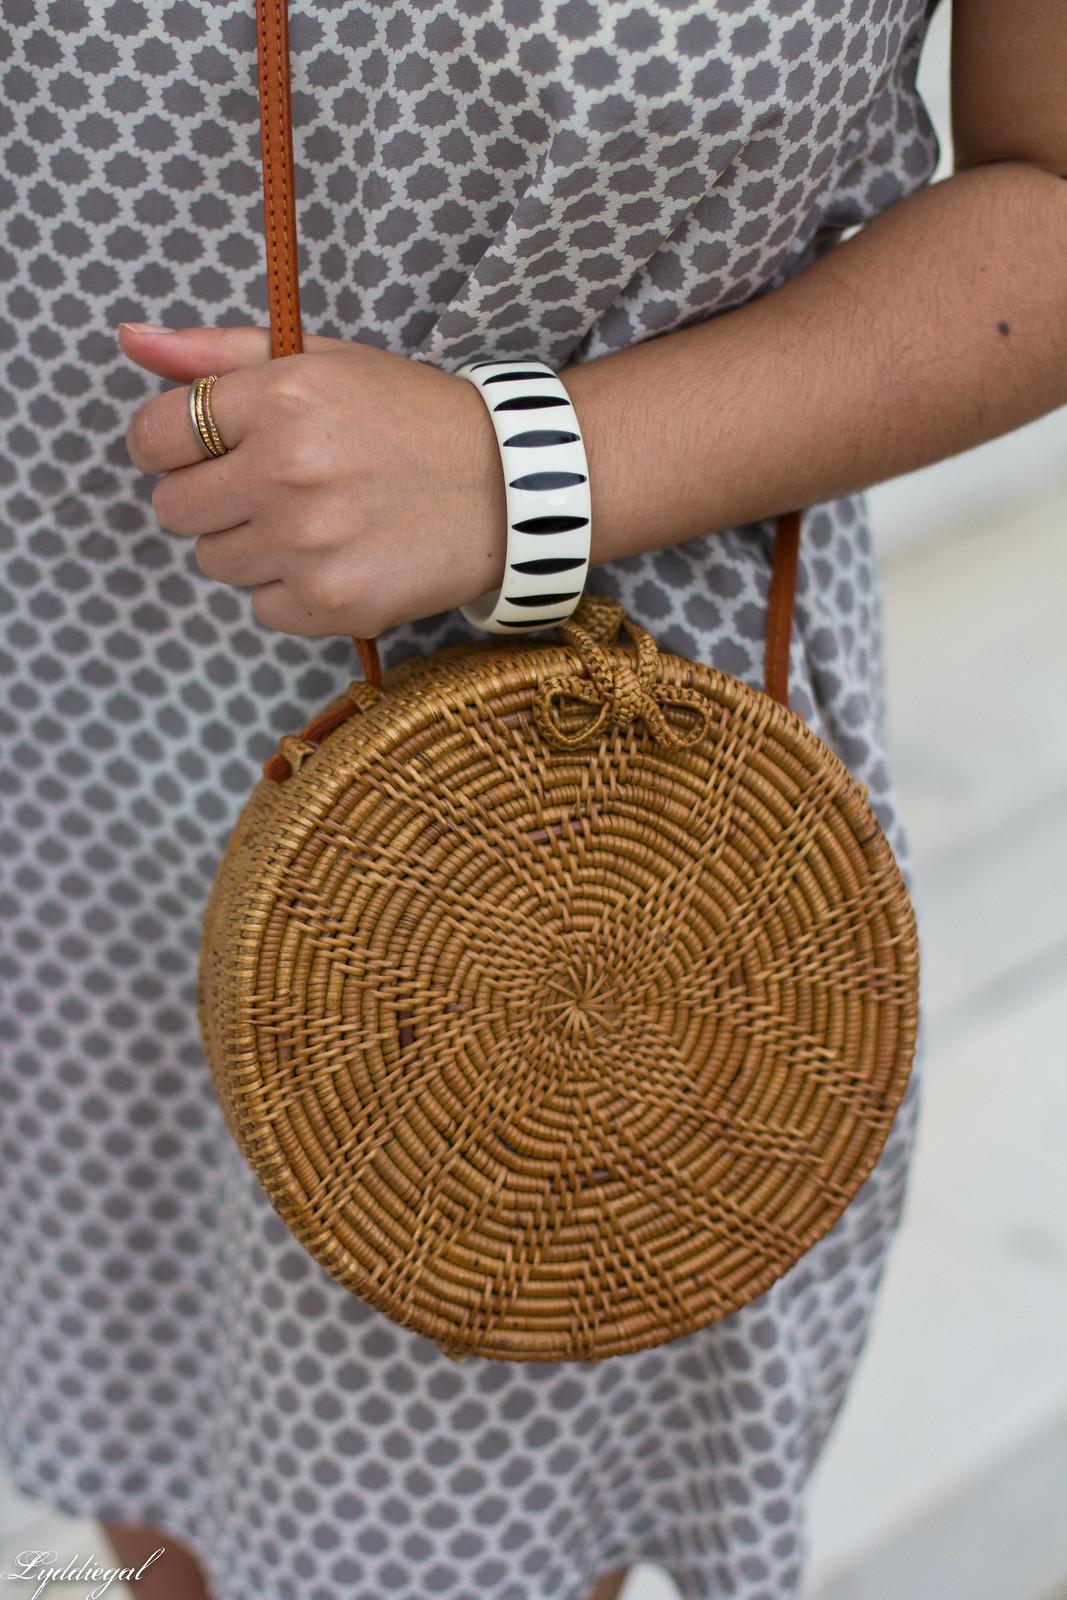 joie cloudburst dress, round straw bag, statement earrings-4.jpg